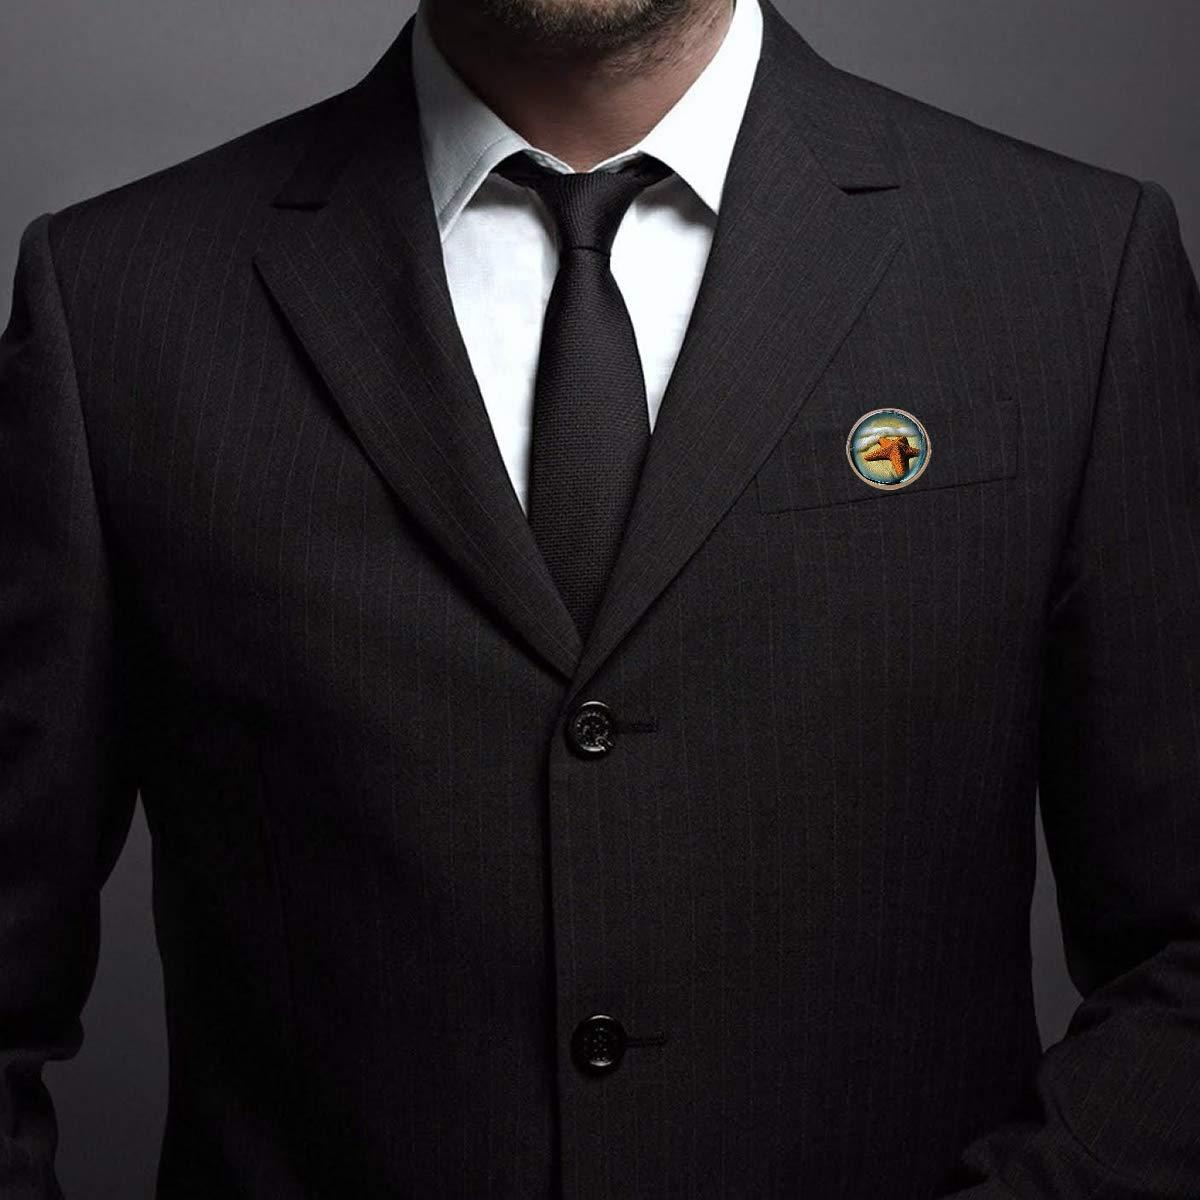 Pinback Buttons Badges Pins Orange Starfish Lapel Pin Brooch Clip Trendy Accessory Jacket T-Shirt Bag Hat Shoe